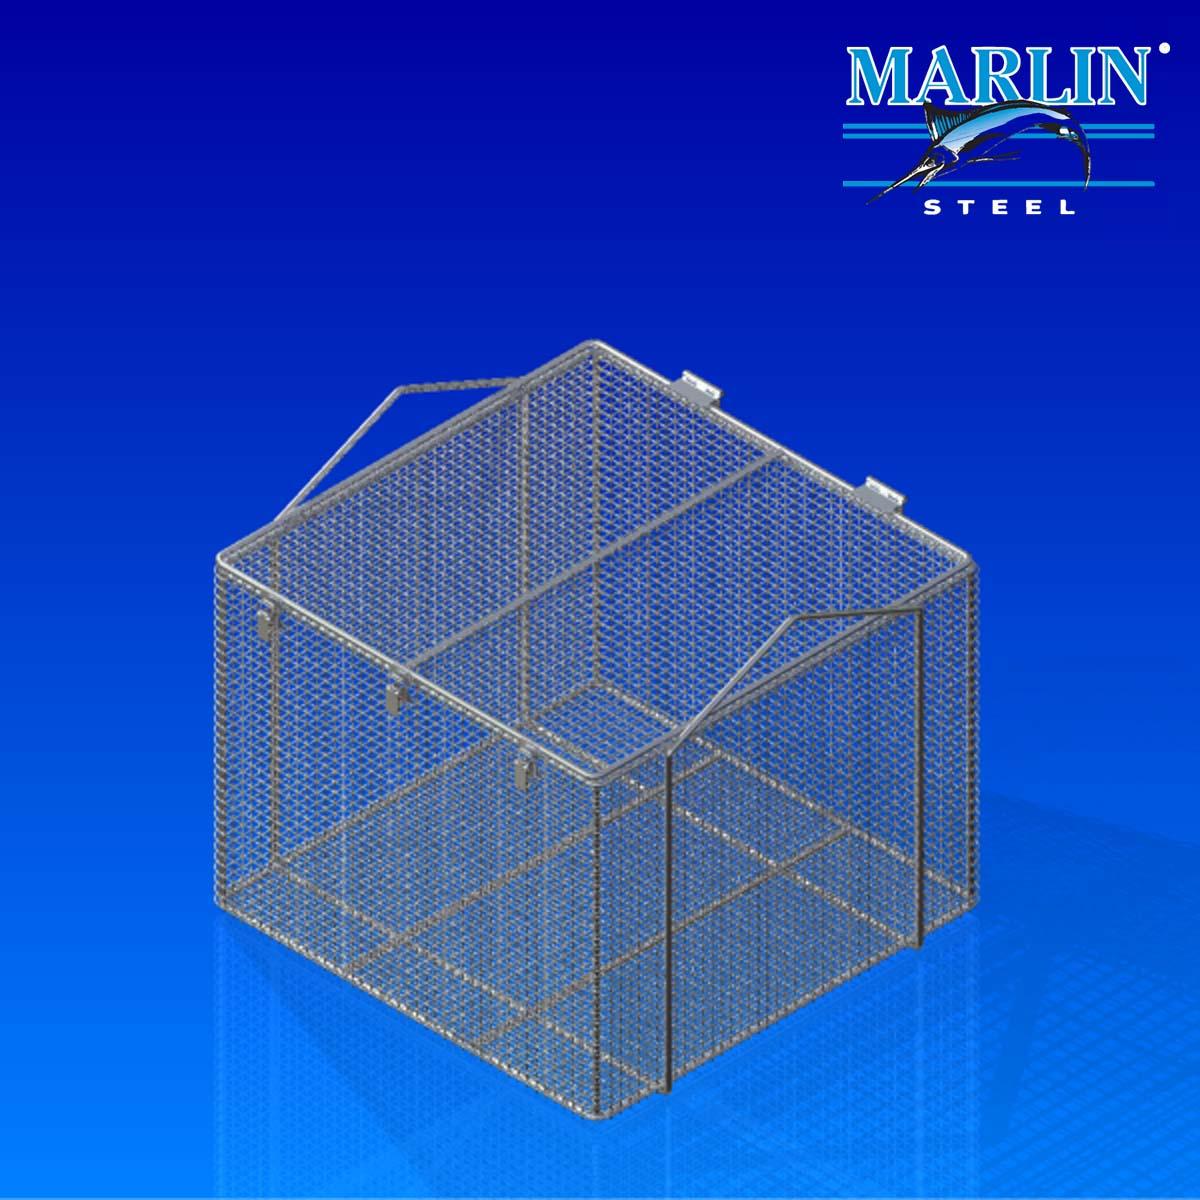 Marlin Steel Basket with Handles 920001